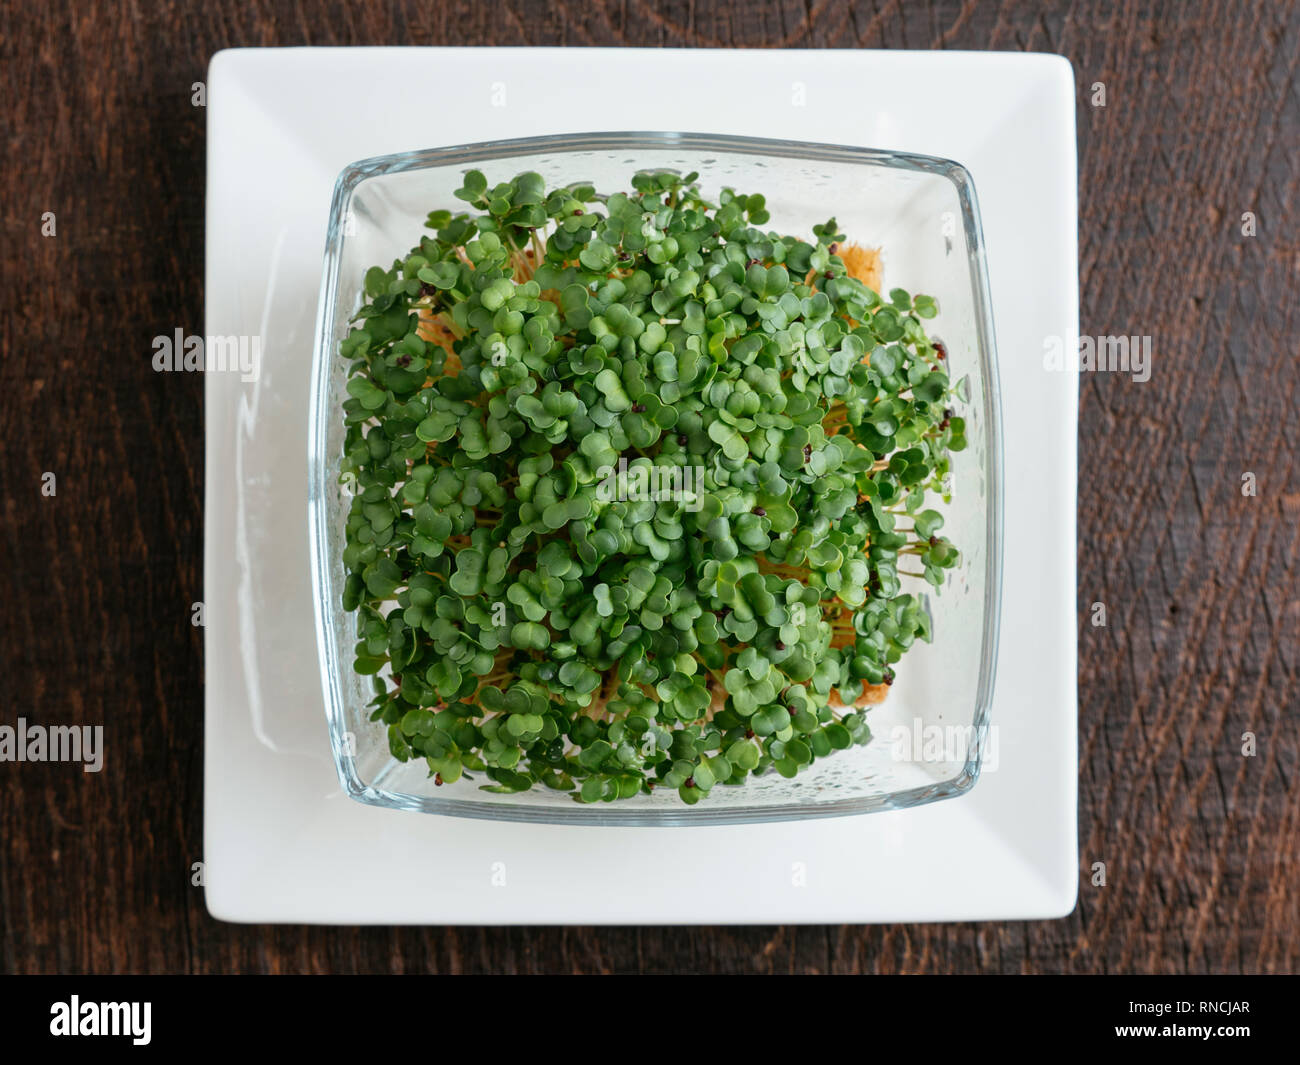 Broccoli Raab (Brassica rapa var. cymosa) sprouts. Stock Photo